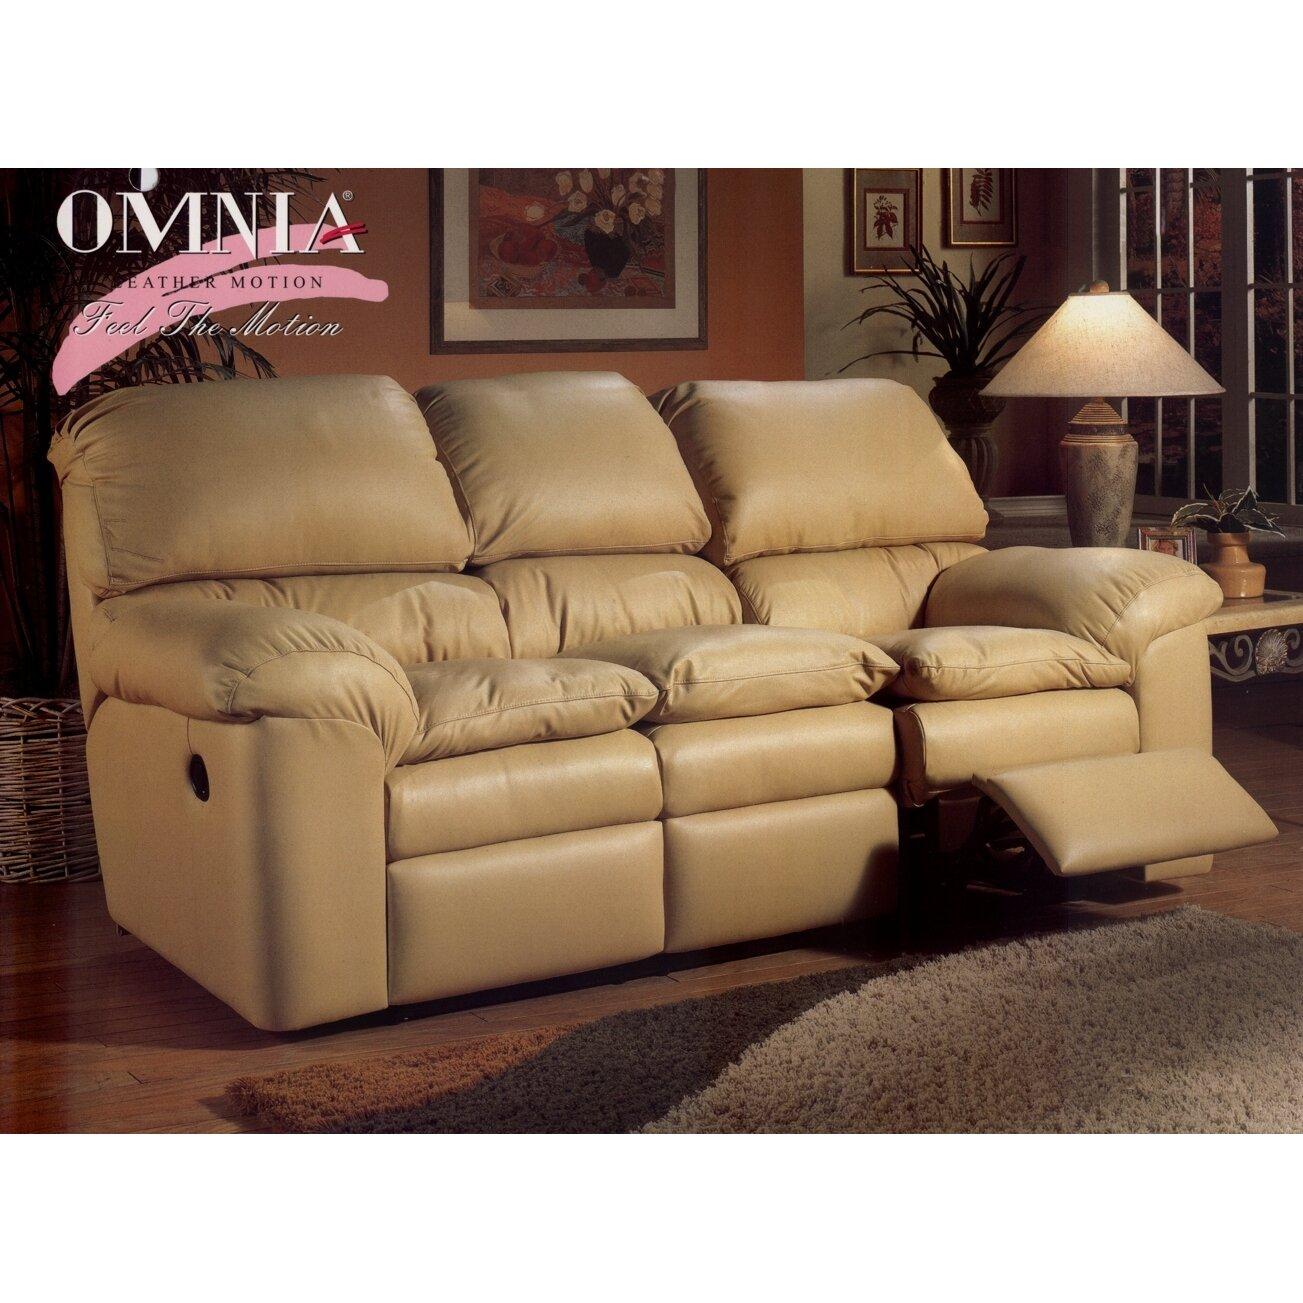 Omnia leather cordova reclining sofa living room set - Living room recliner furniture sets ...